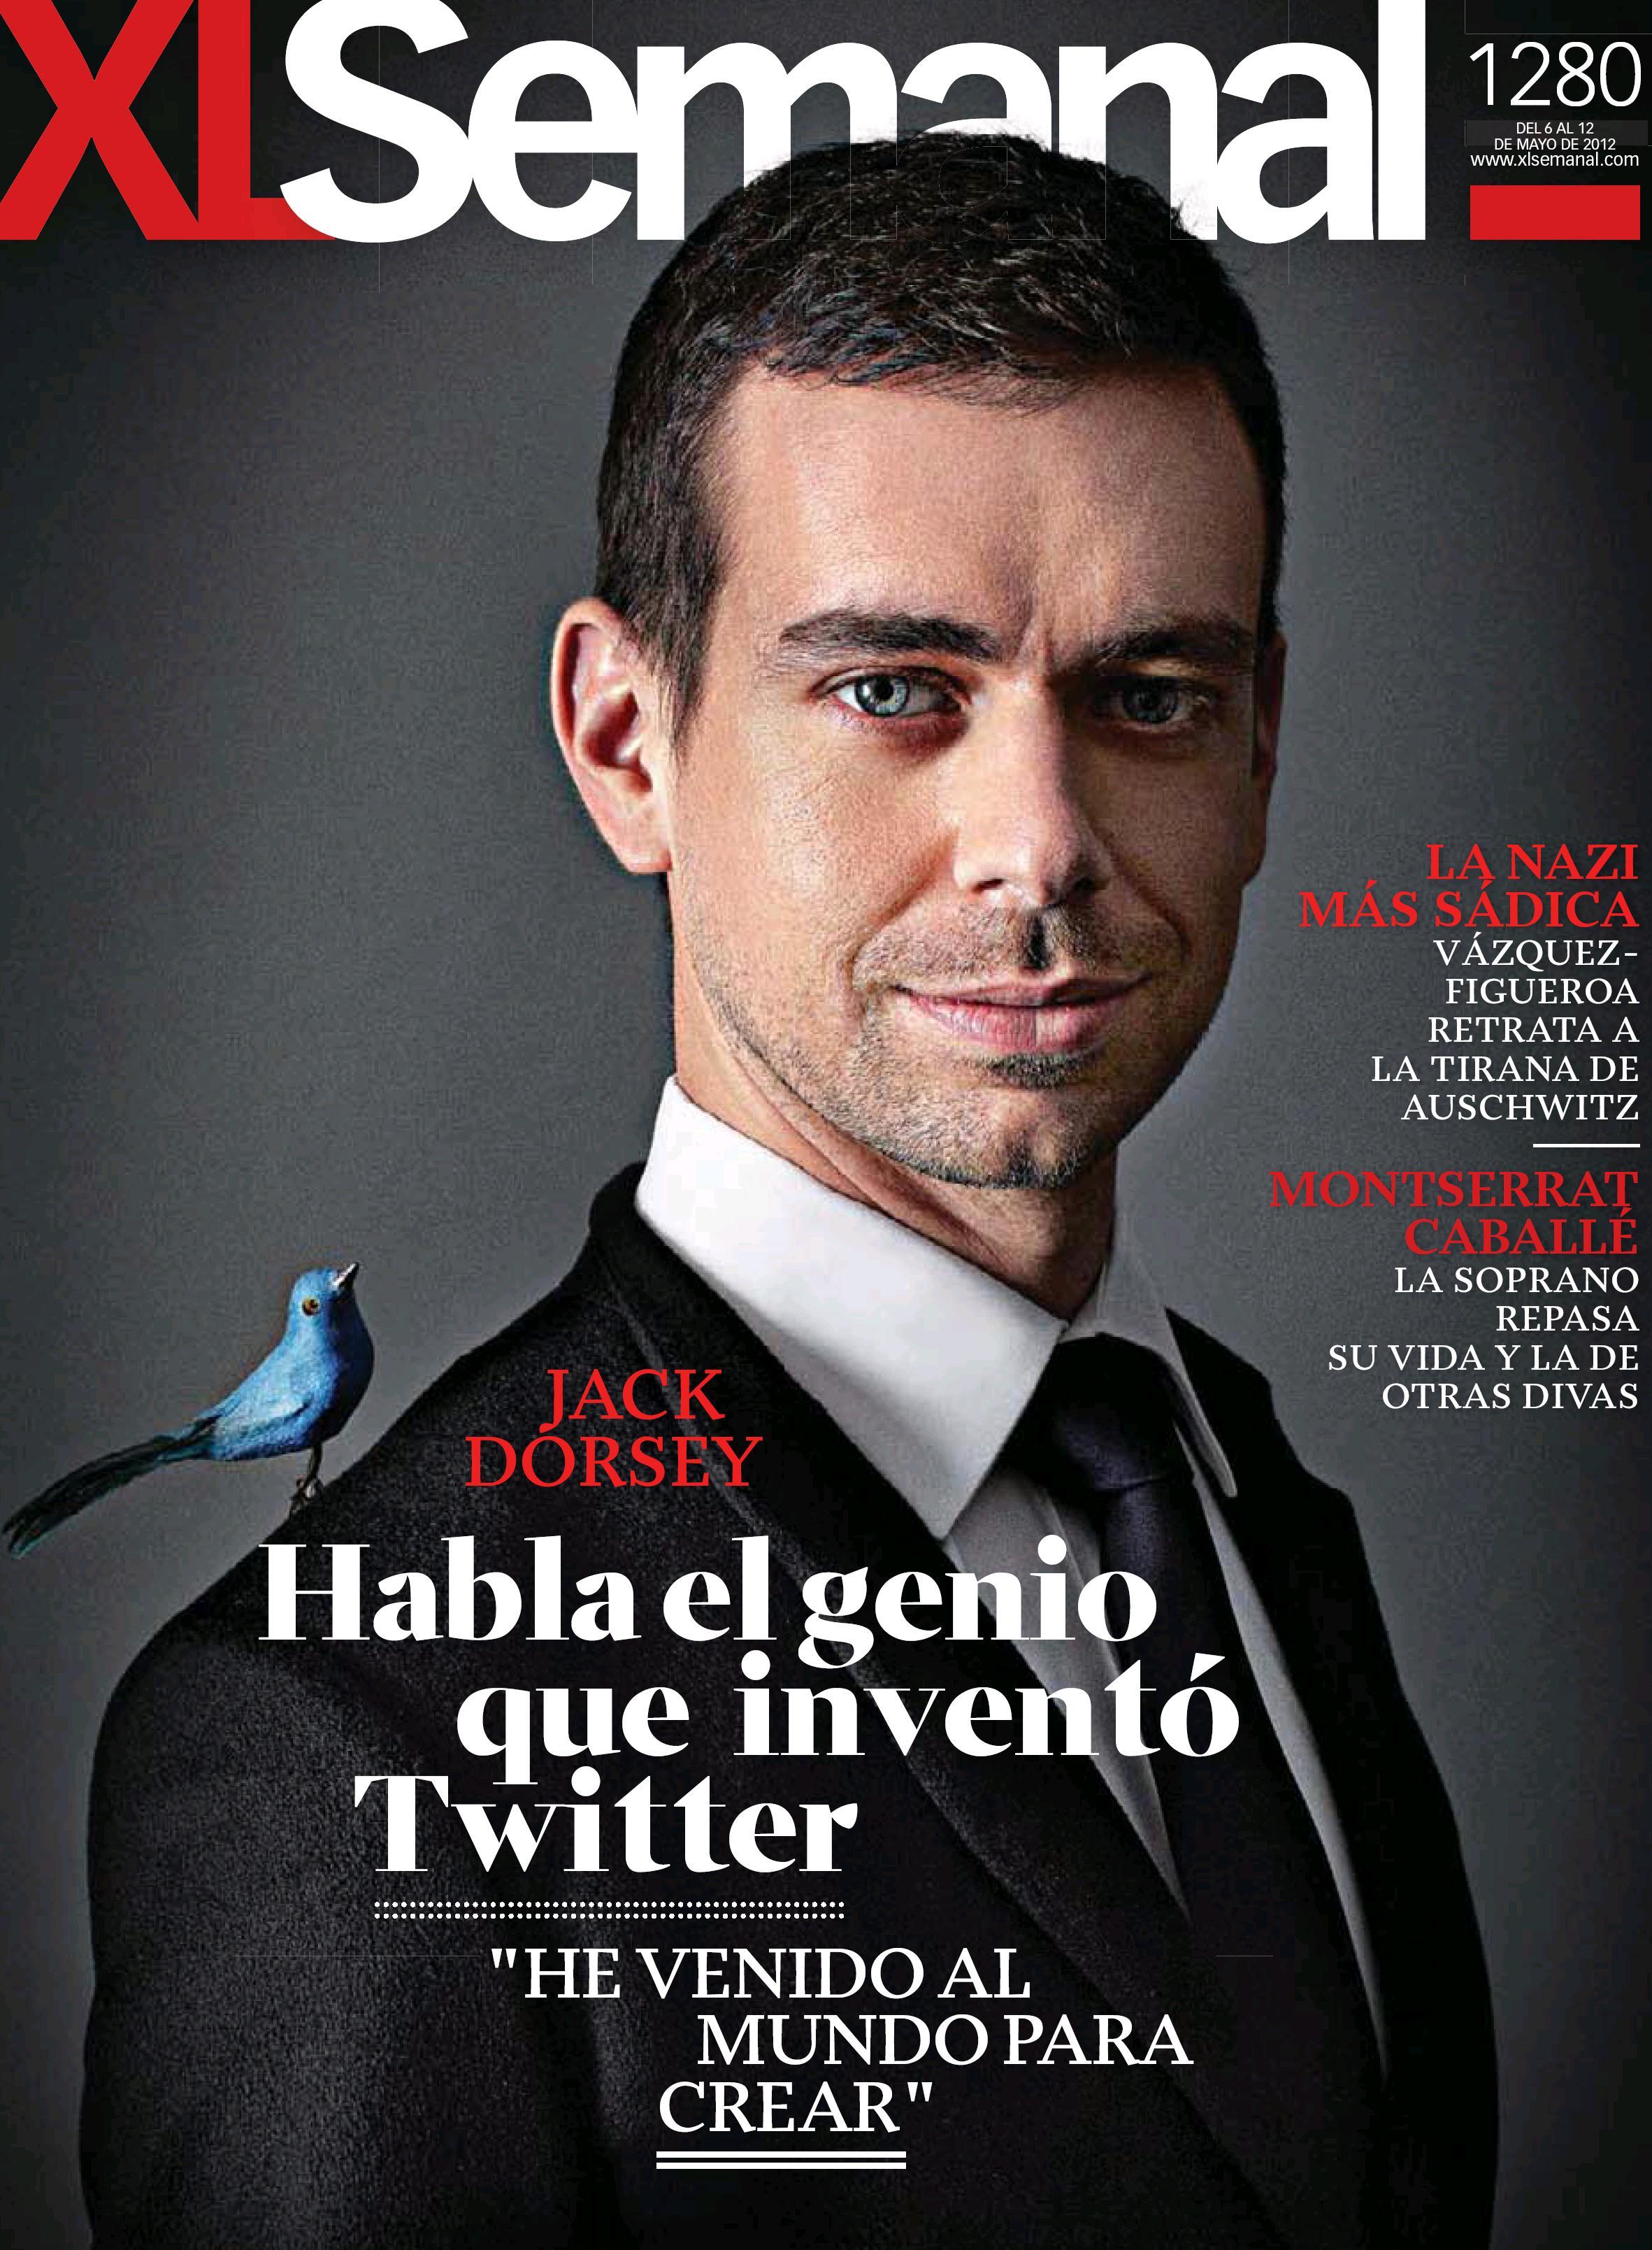 XL SEMANAL portada 6 mayo 2012